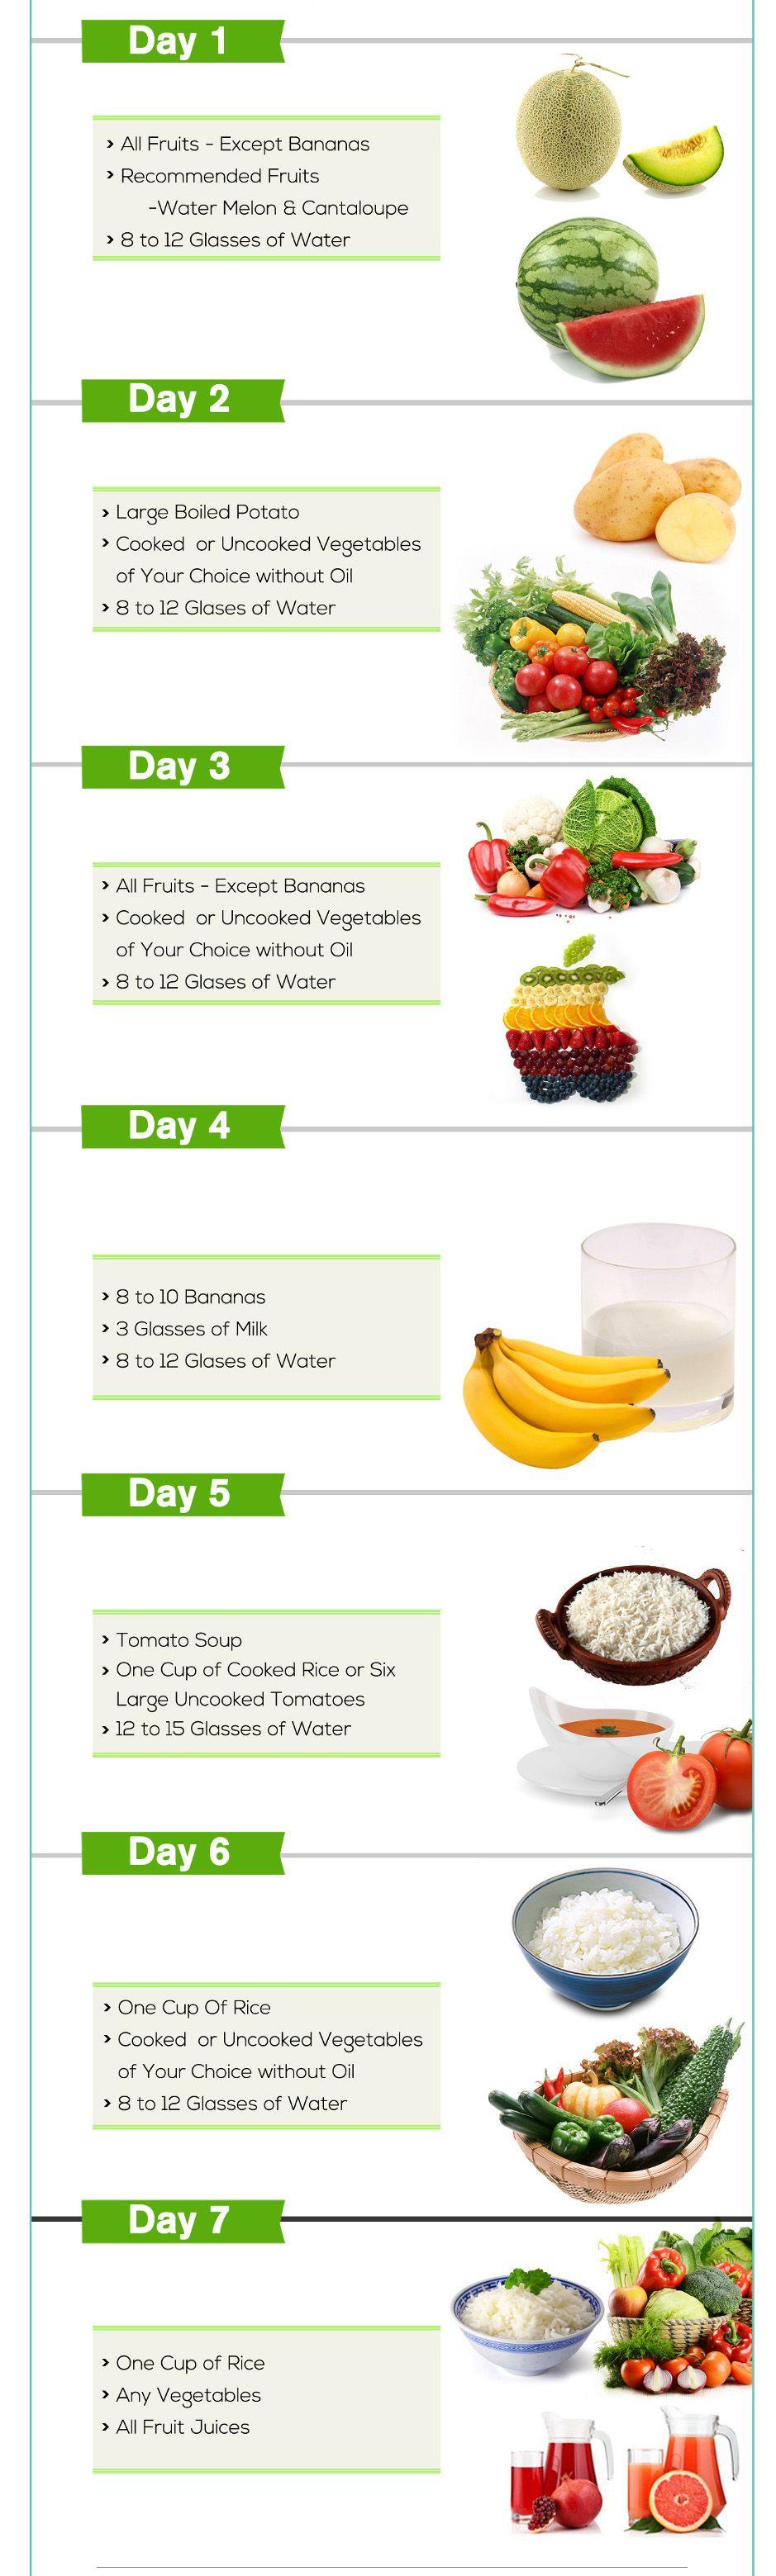 High protein weight loss menu plan